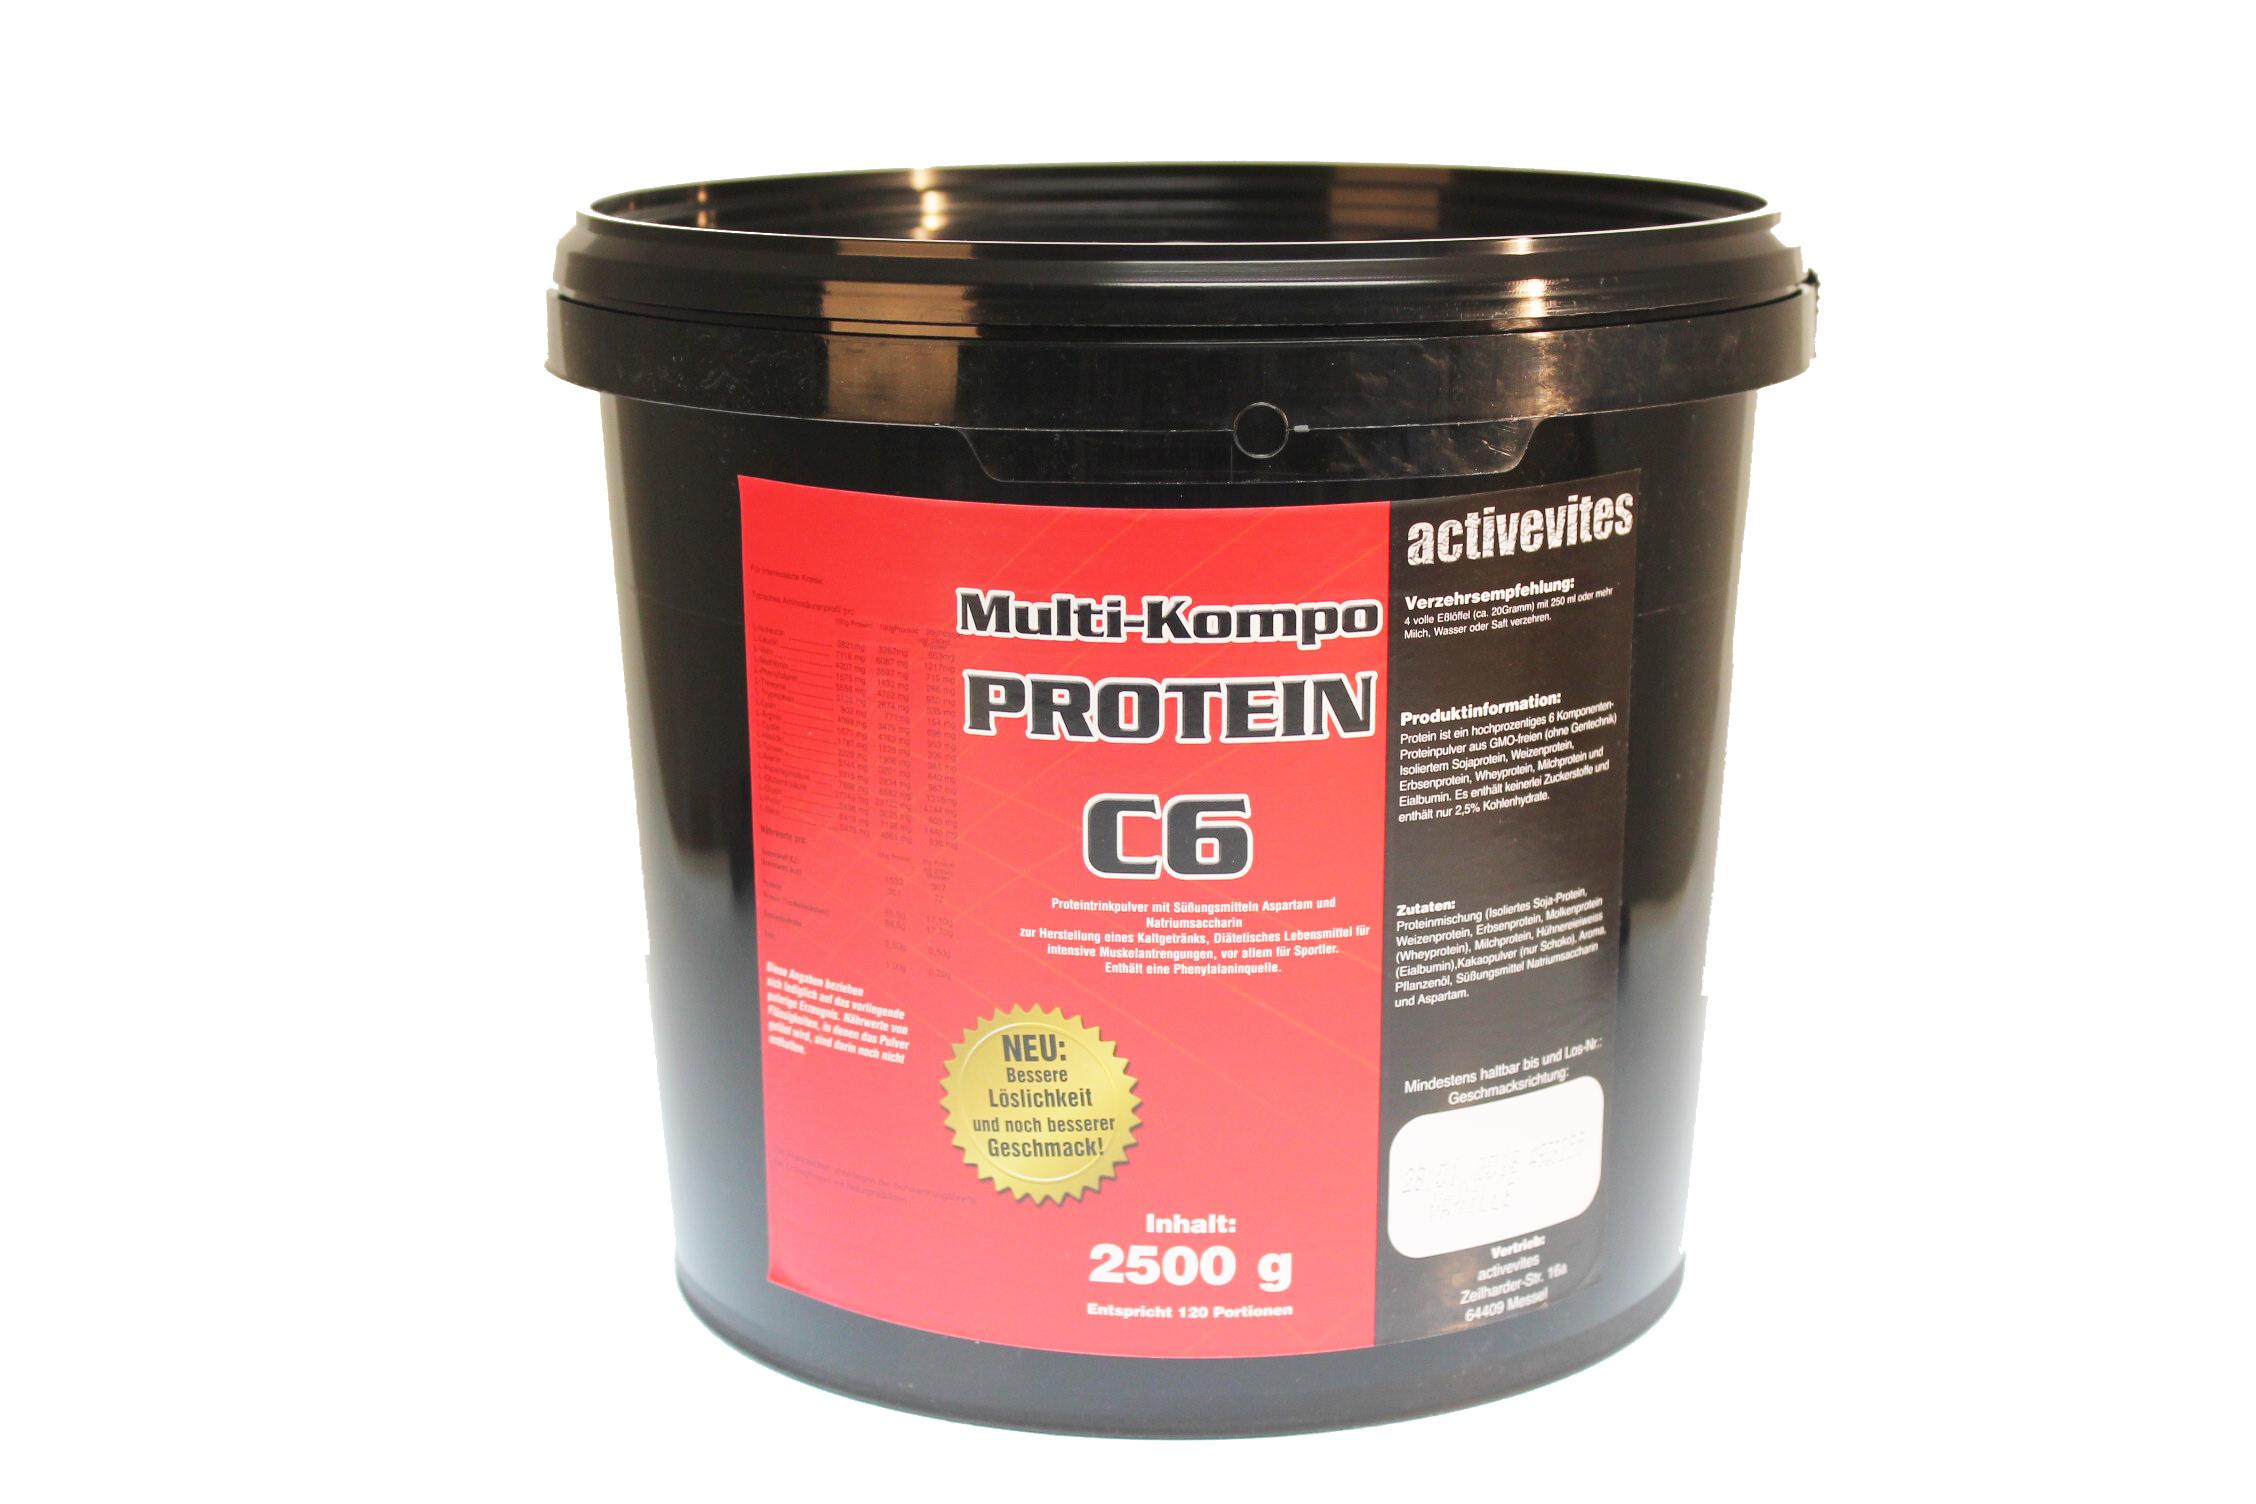 protein 90 c6 weiss sportnahrung f r muskelaufbau. Black Bedroom Furniture Sets. Home Design Ideas